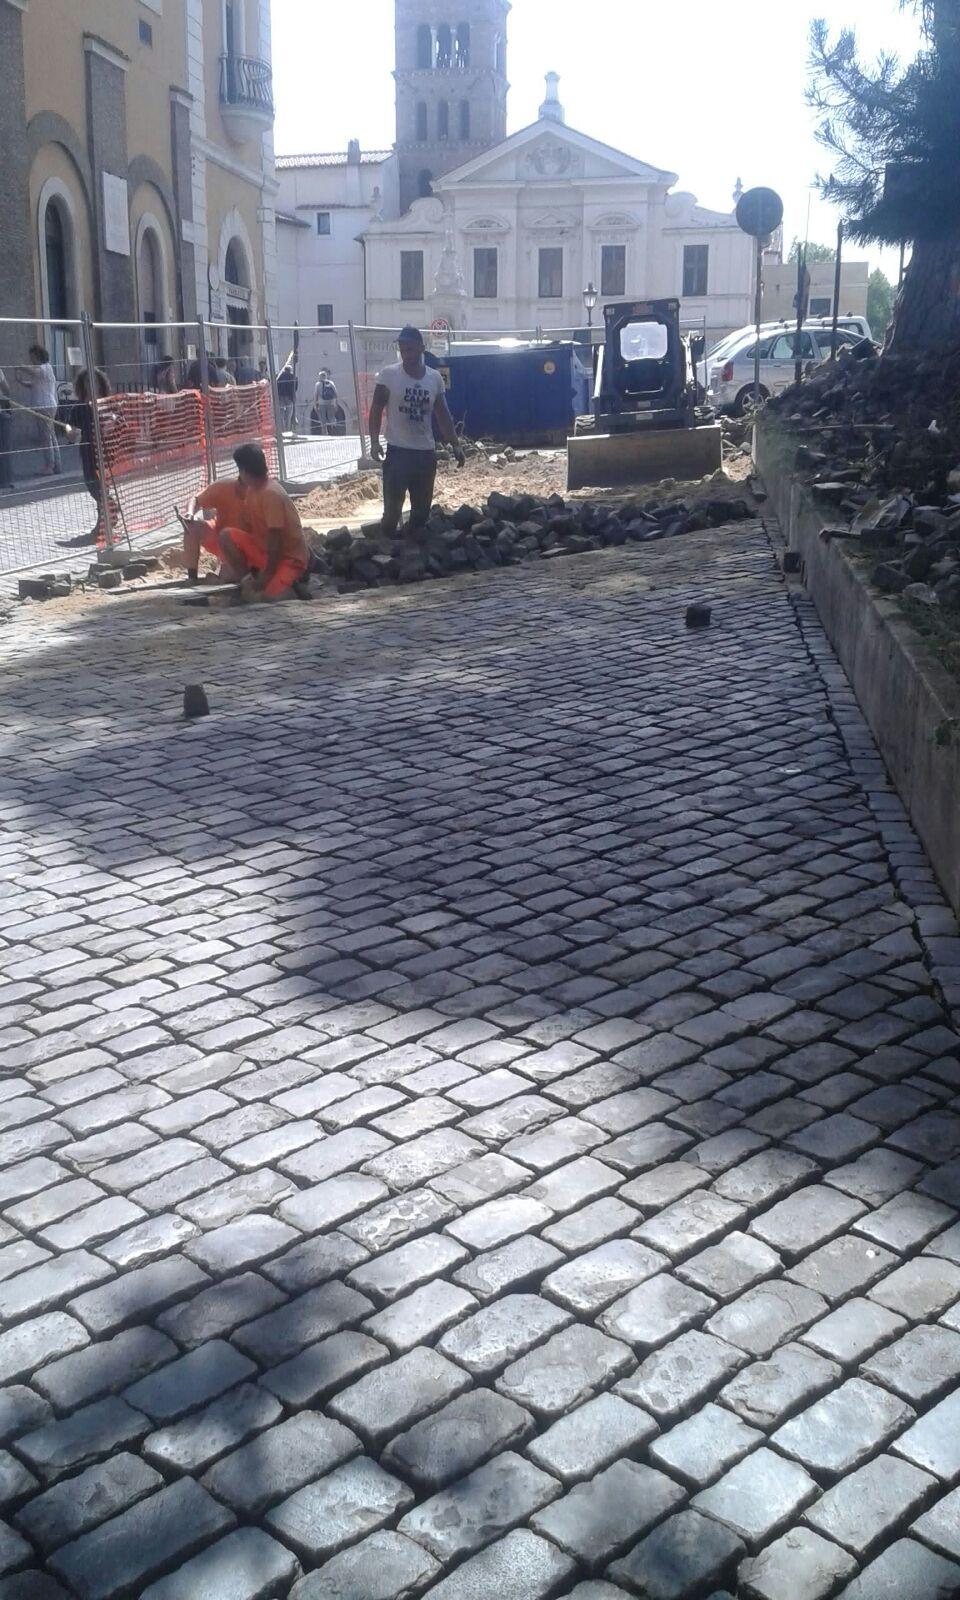 strada cittadina in pietra